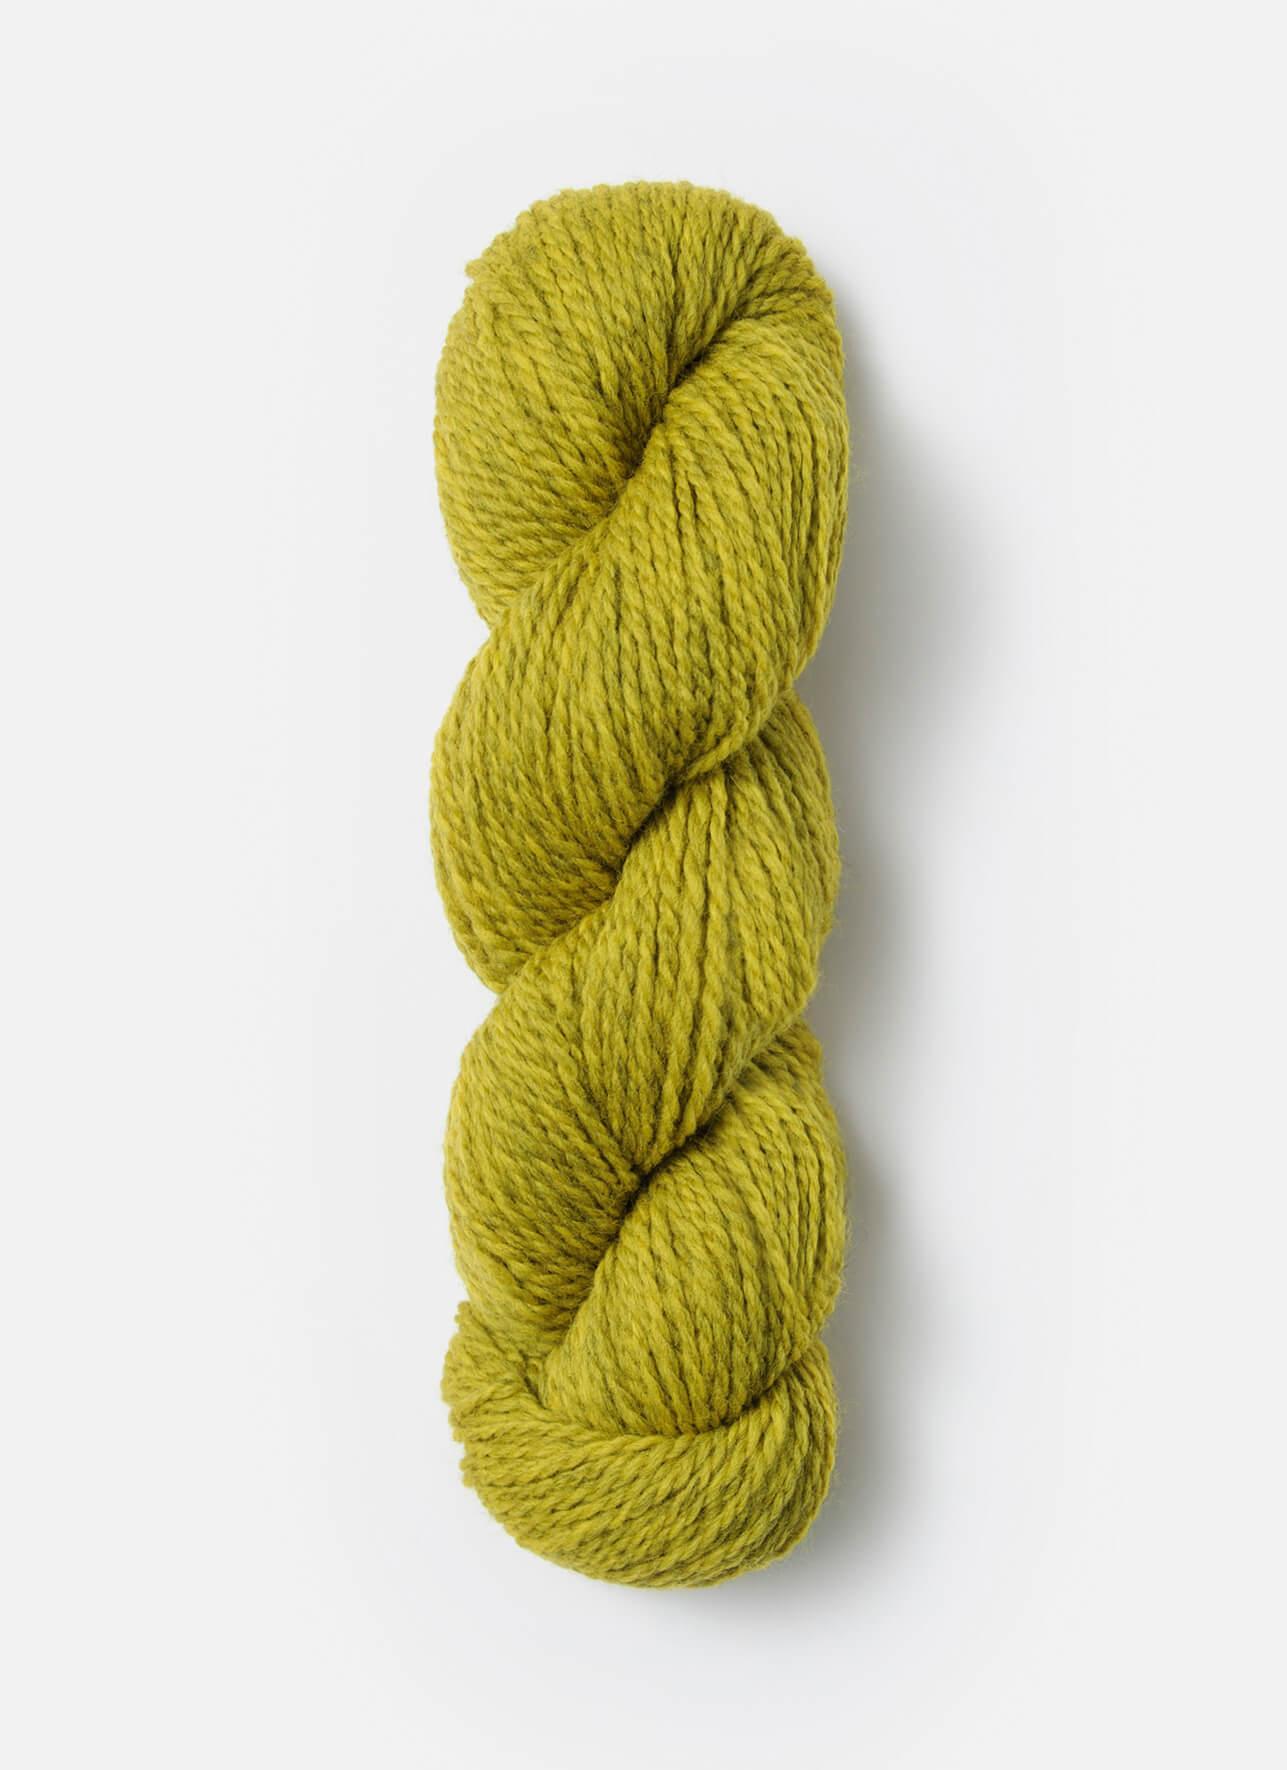 No. 1308: Golden Meadow